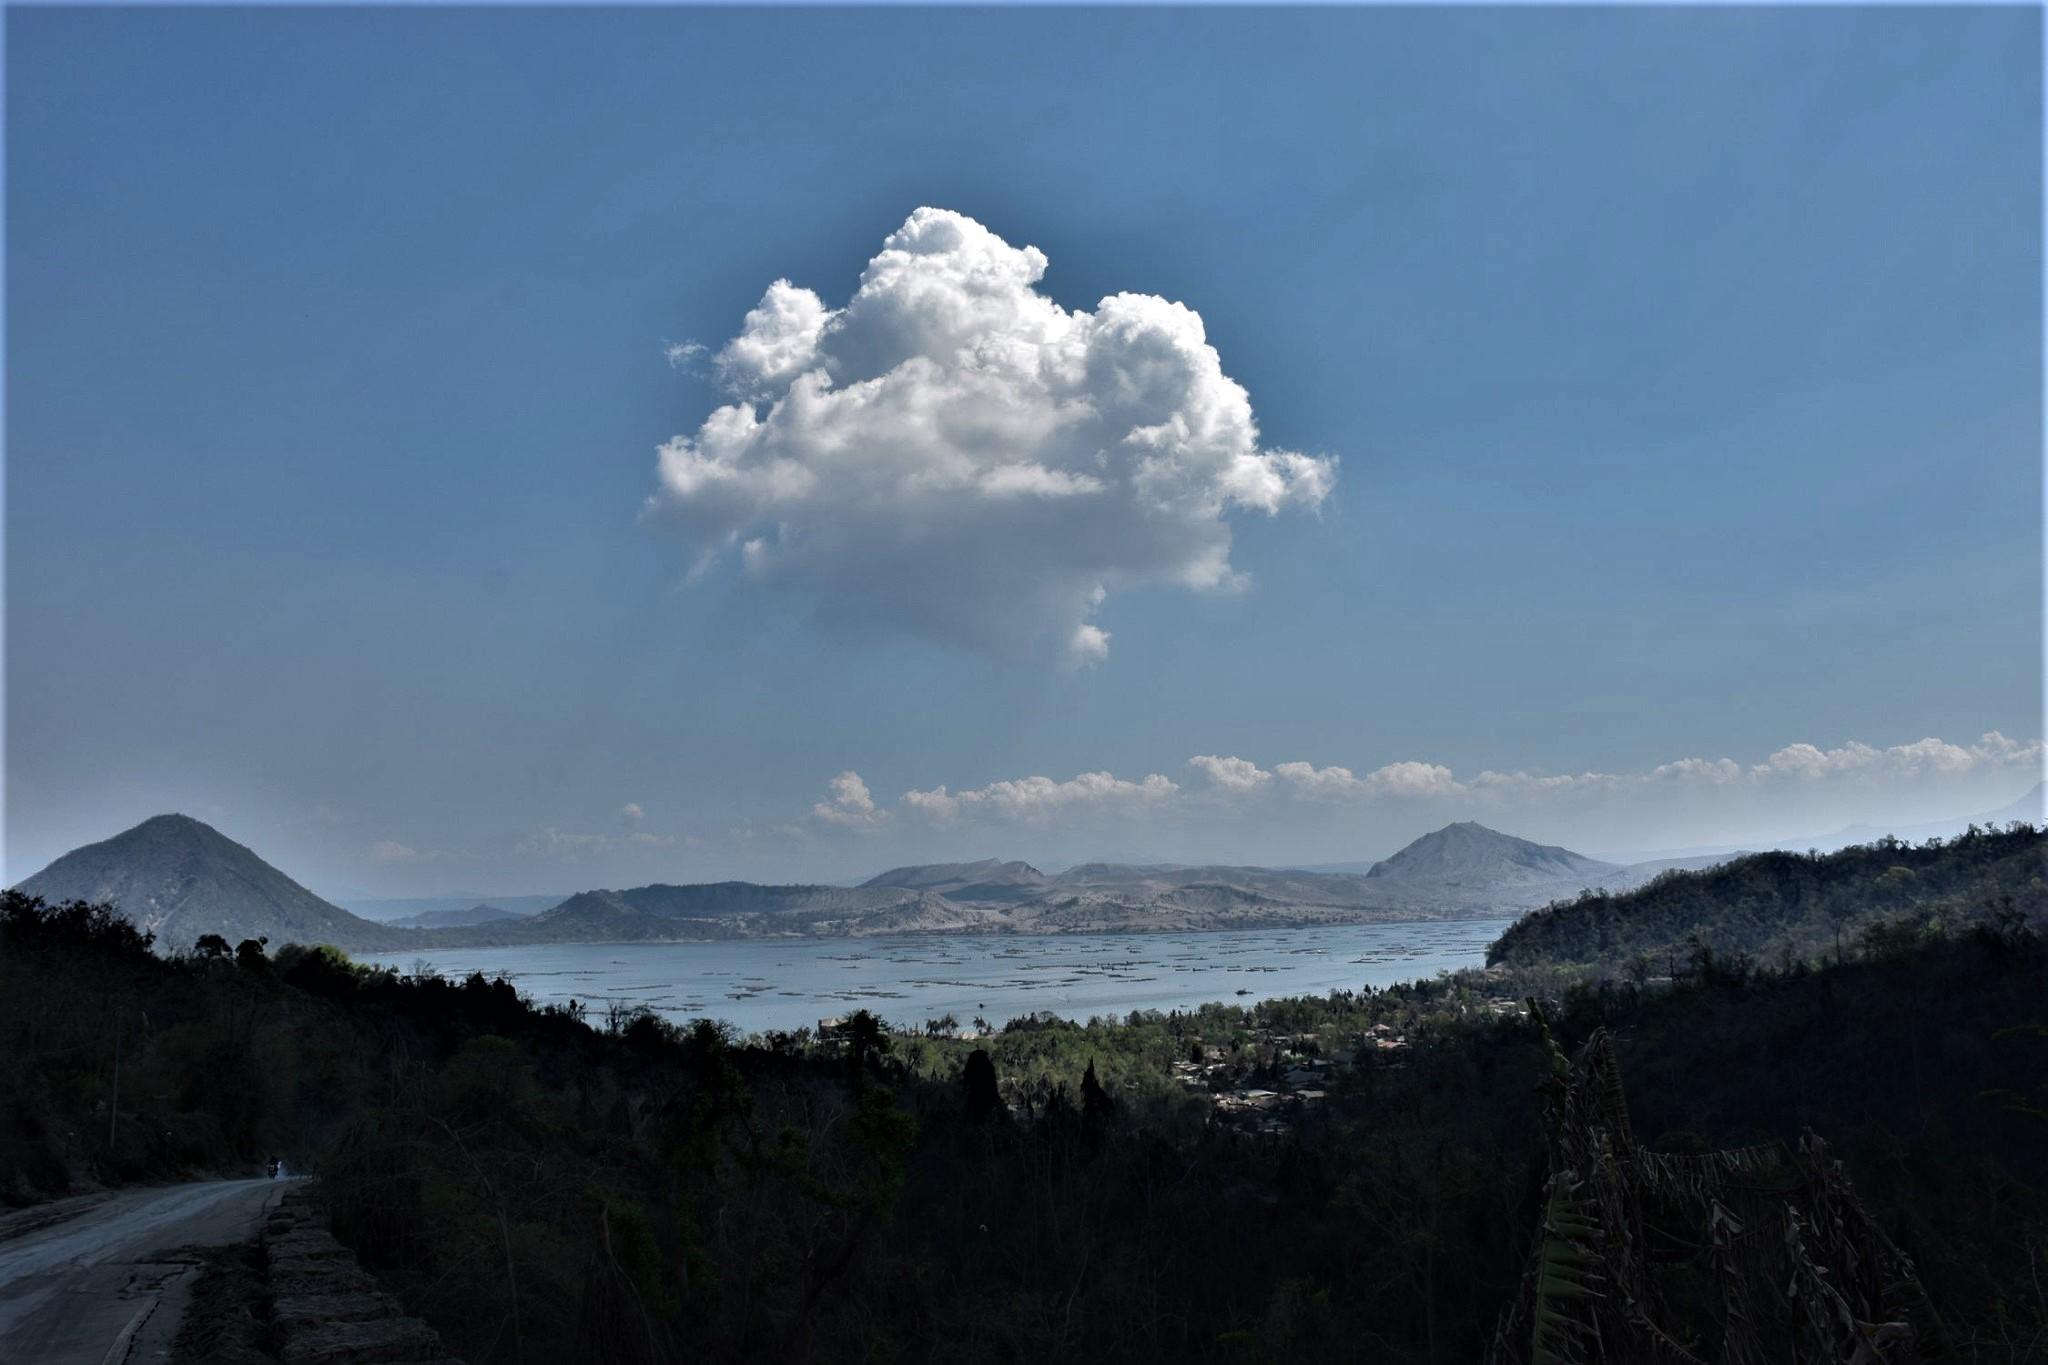 February 09 ,2020. EN . Kamchatka : Klyuchevskoy , Philippines : Taal / Mayon , Indonesia : Anak Krakatau , Ecuador : Sangay , Costa Rica : Poas / Rincon de la Vieja .